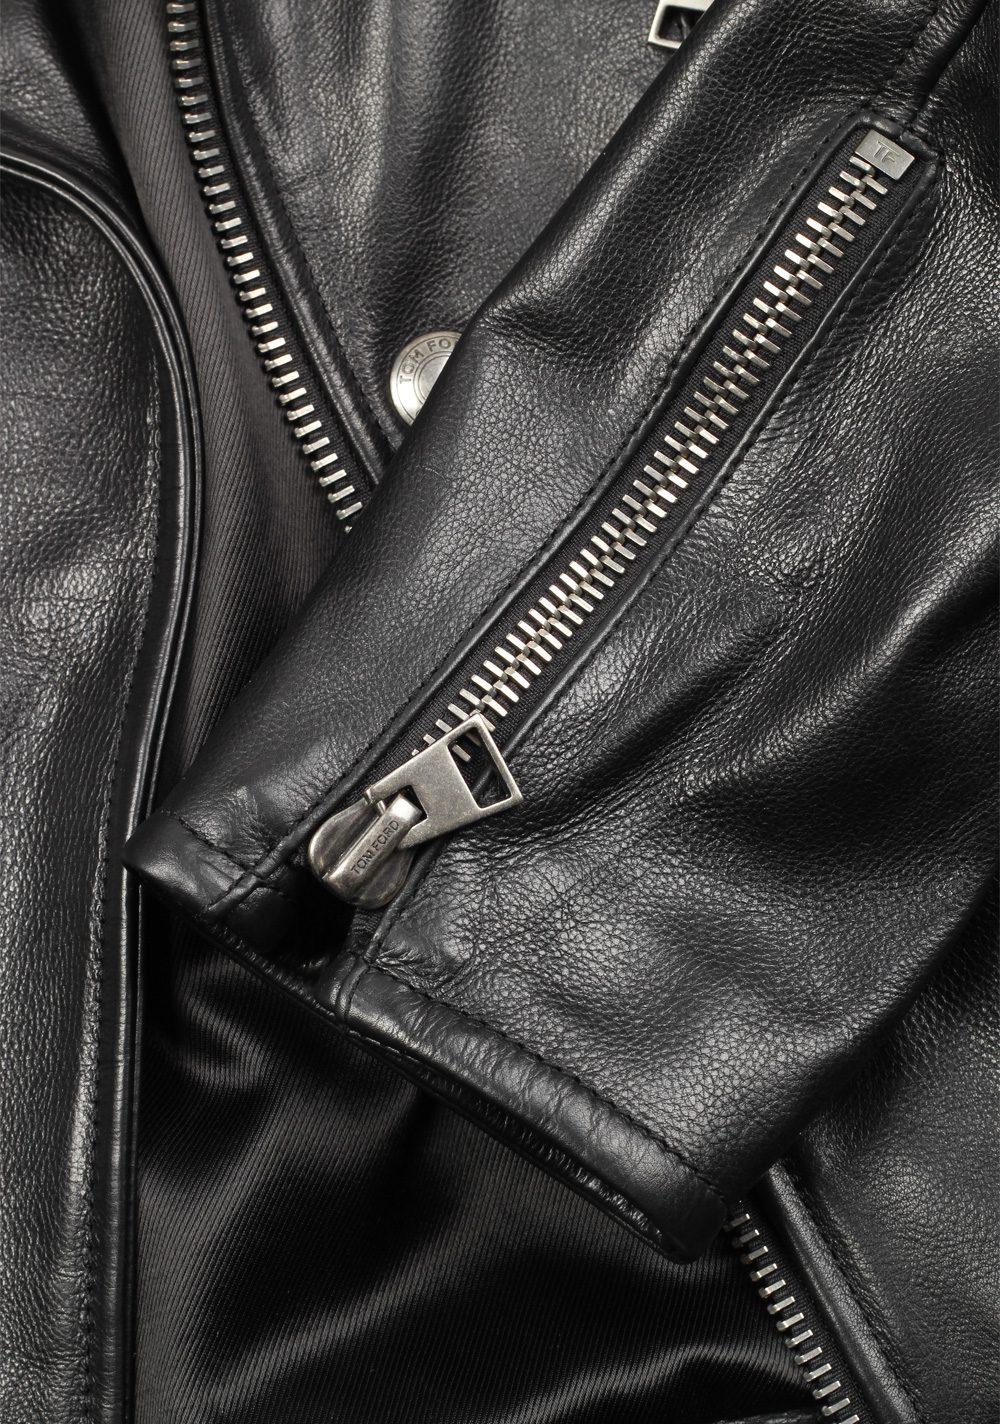 TOM FORD Black Biker Leather Jacket Coat Size 48 / 38R U.S. Outerwear | Costume Limité